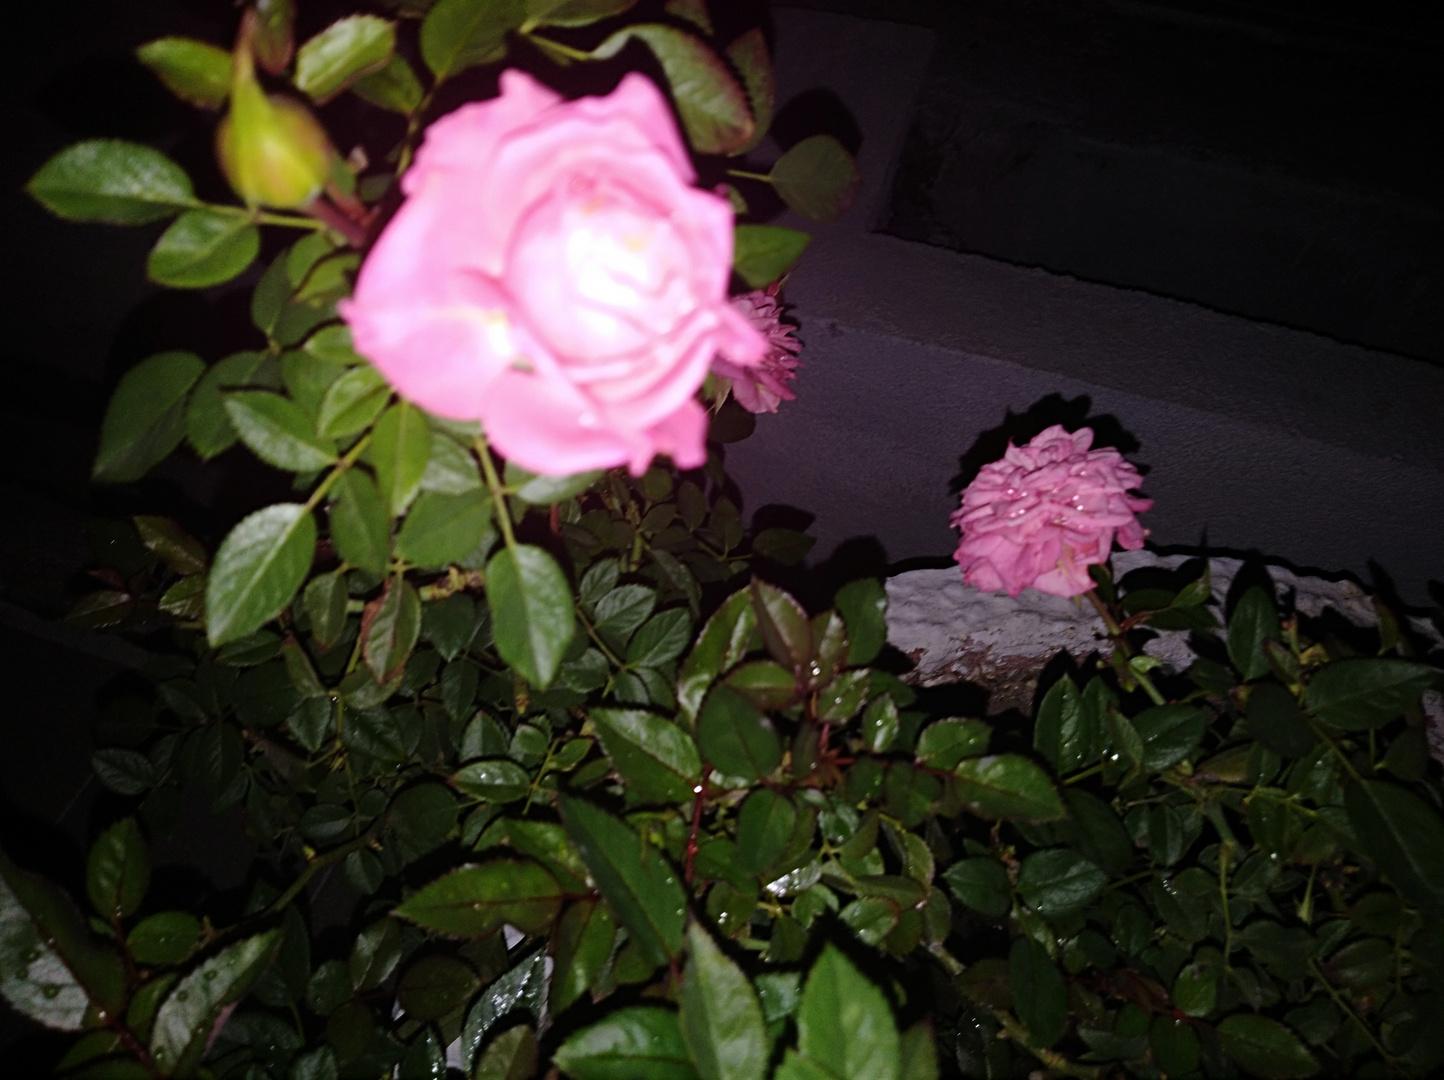 Flor De Noche III